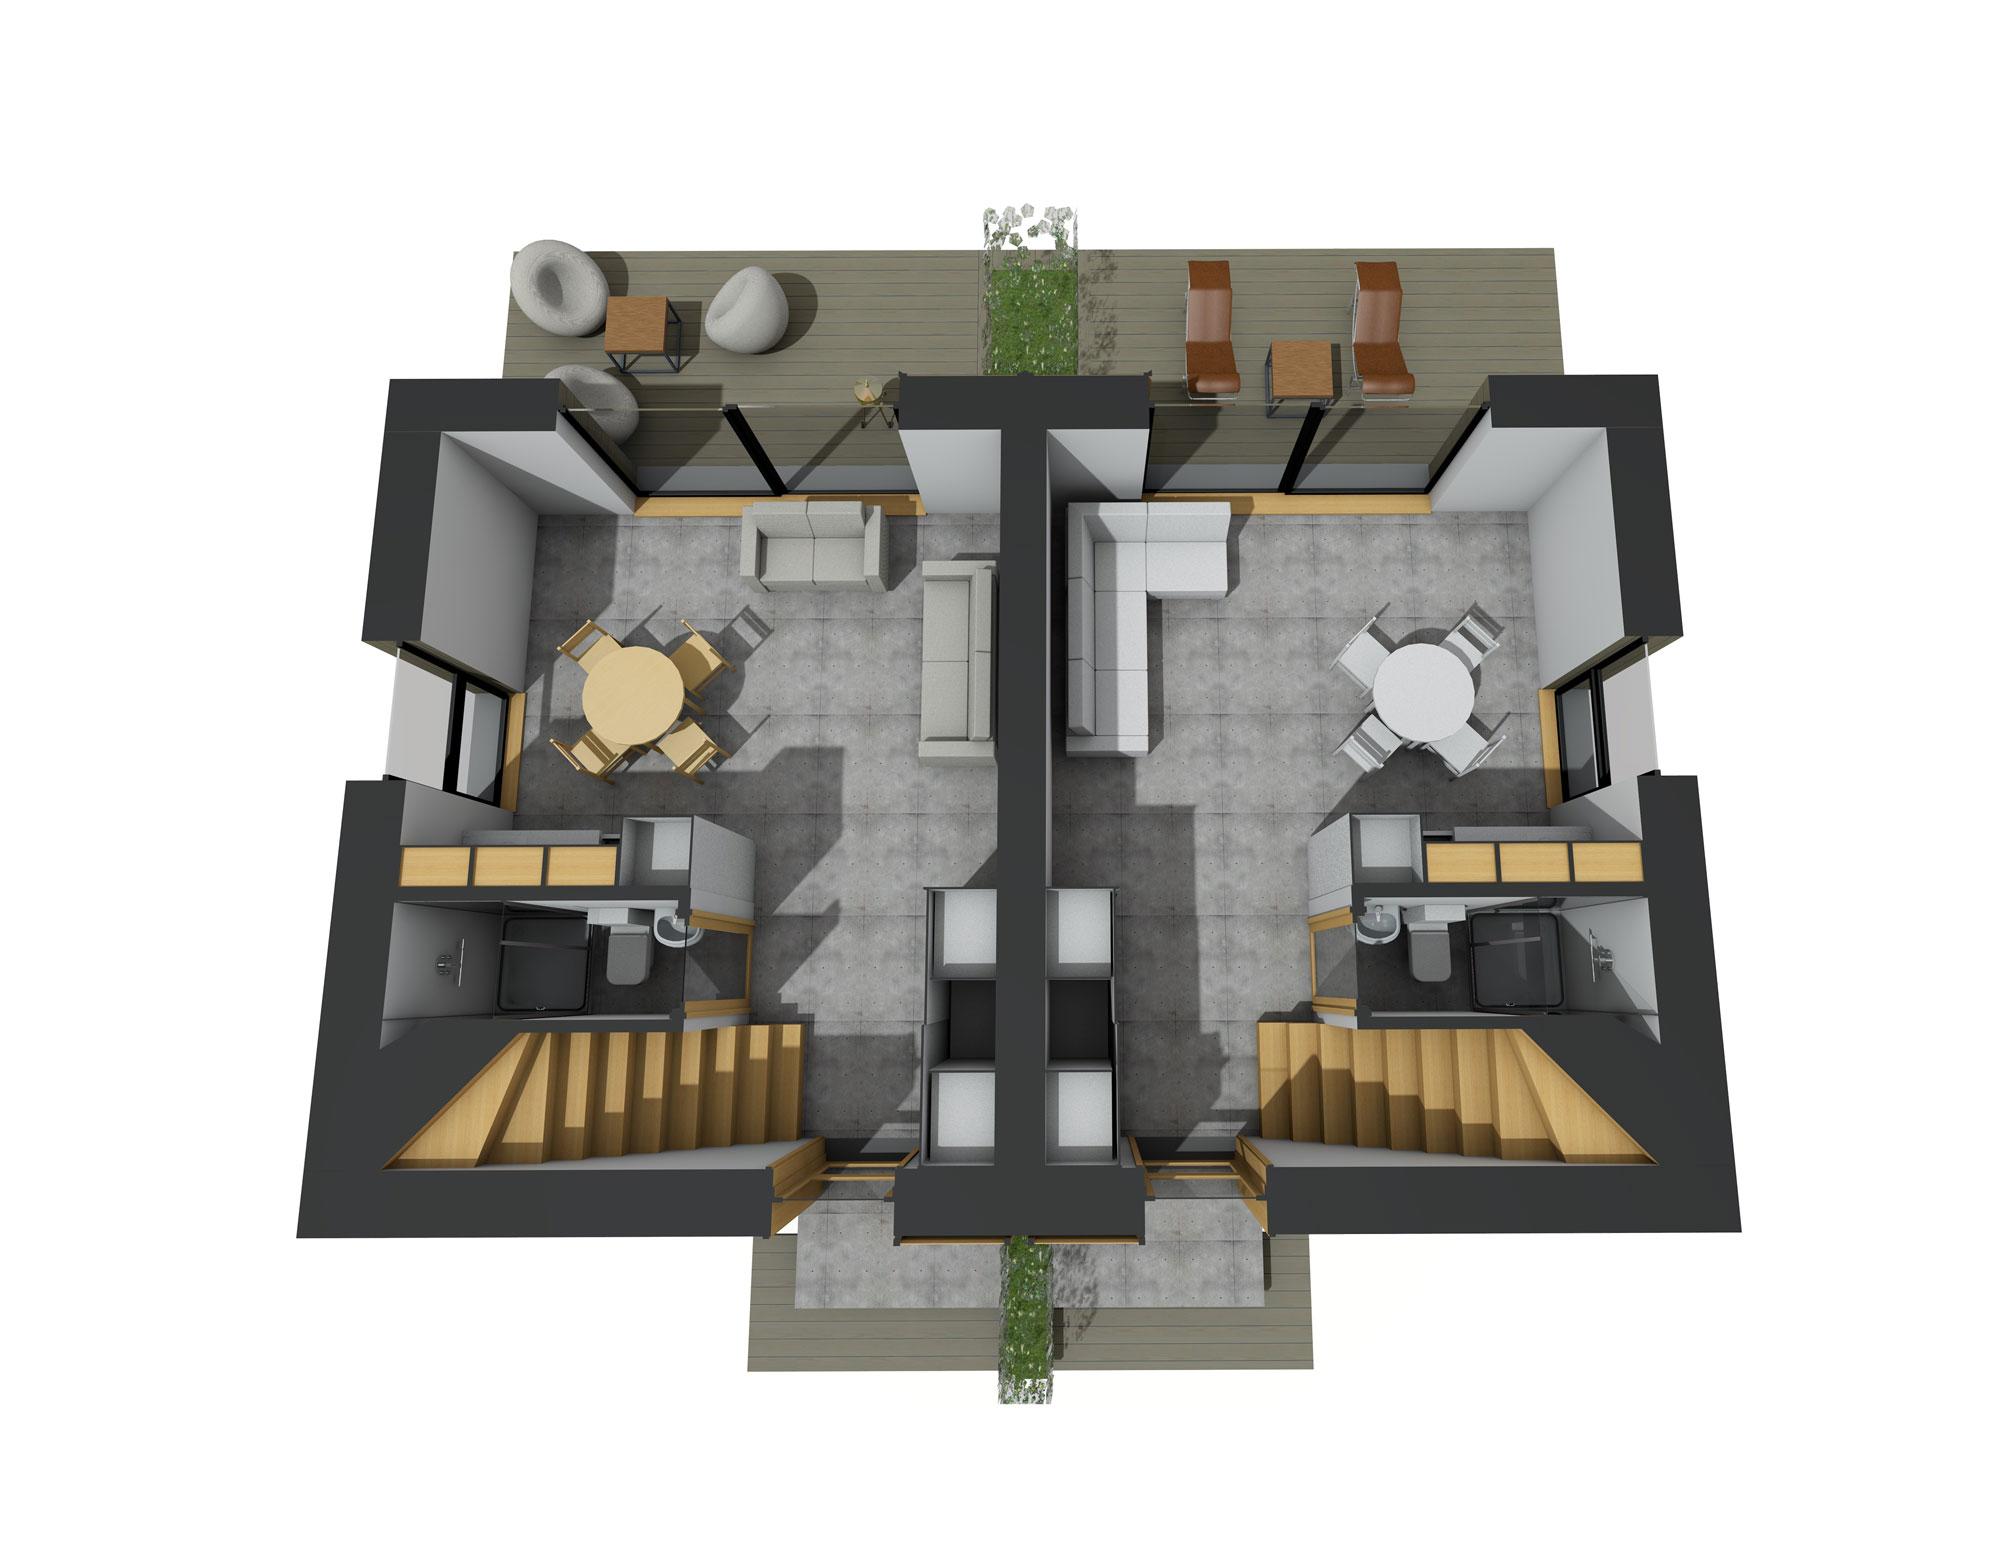 https://akprojektai.lt/wp-content/uploads/2021/06/dvibutis-1A.jpg